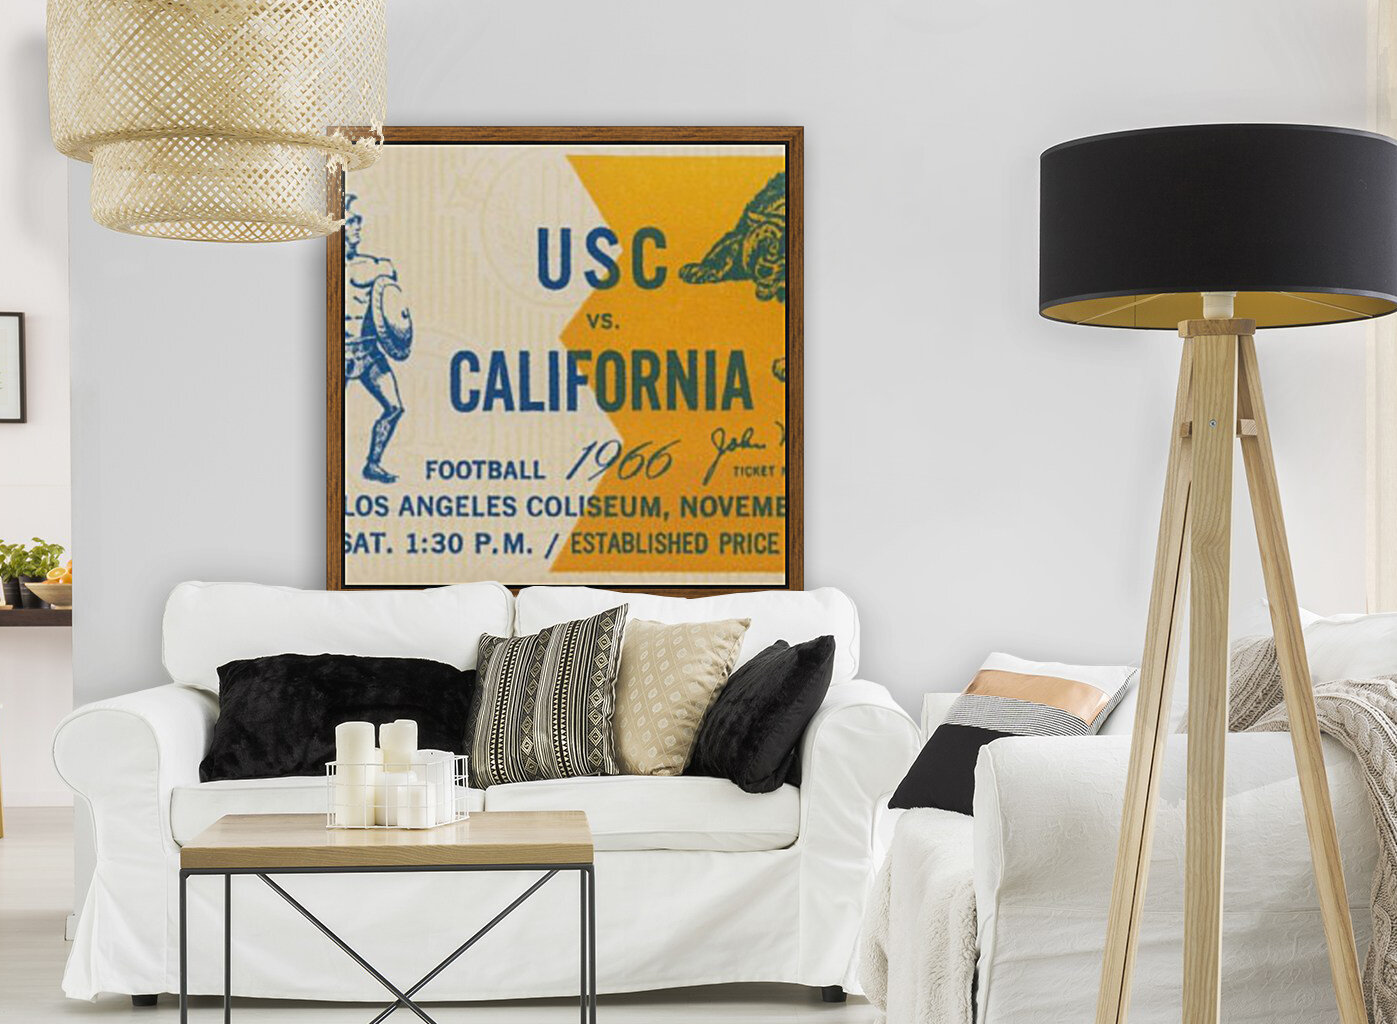 College Football Ticket Stub Collection_1966 USC vs. California Football Ticket Art Row One Brand (1)  Art